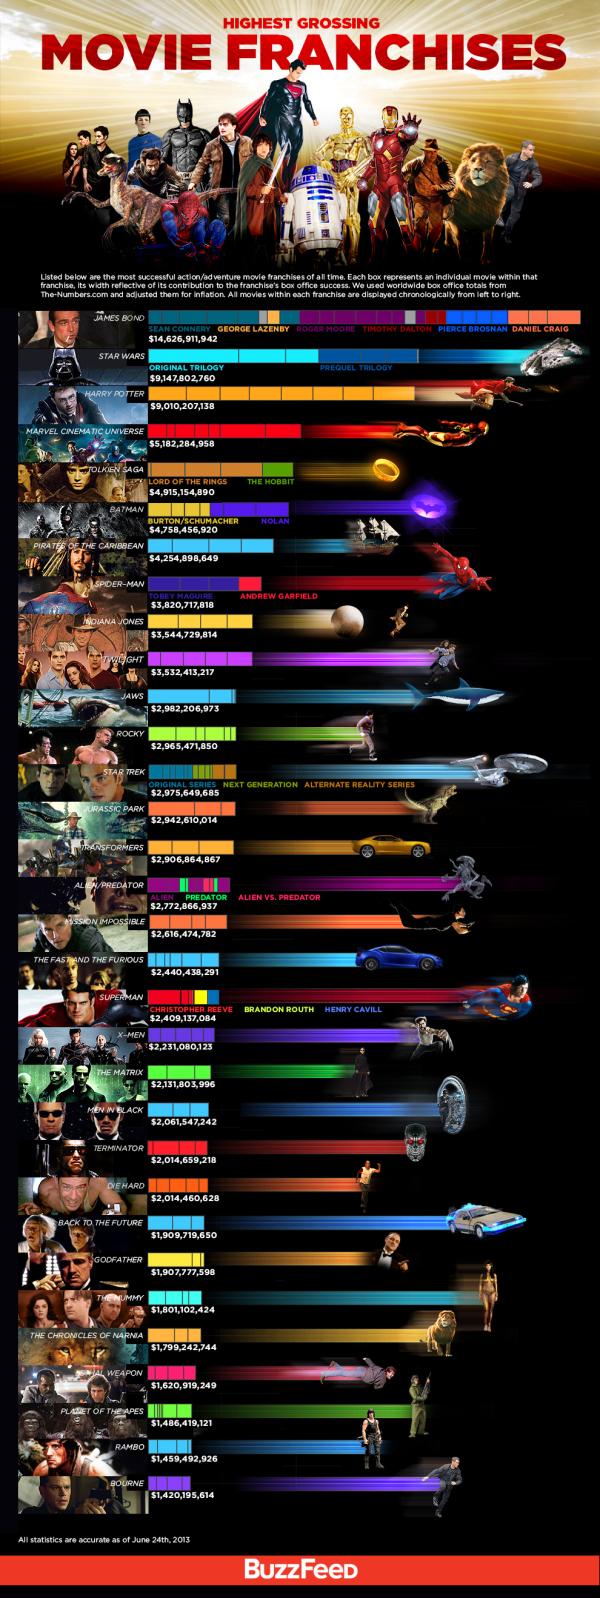 Highest Grossing Movie Franchises infographic